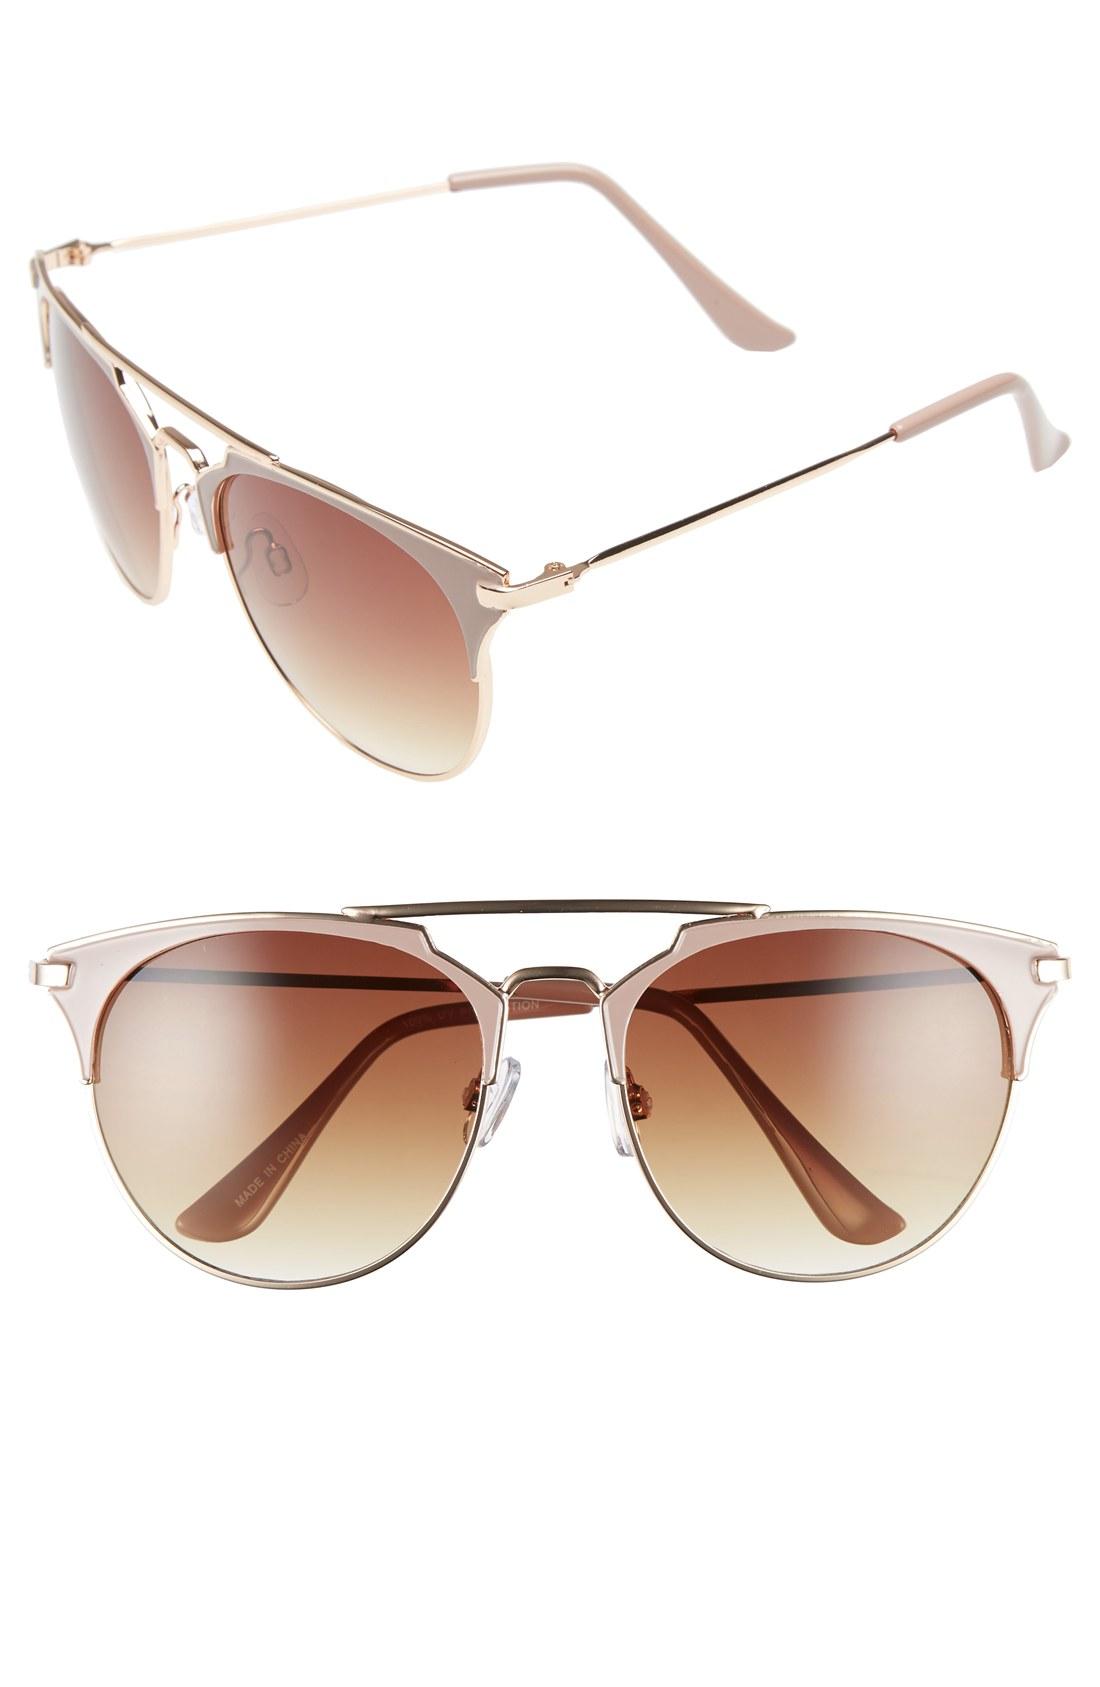 $12 sunglasses